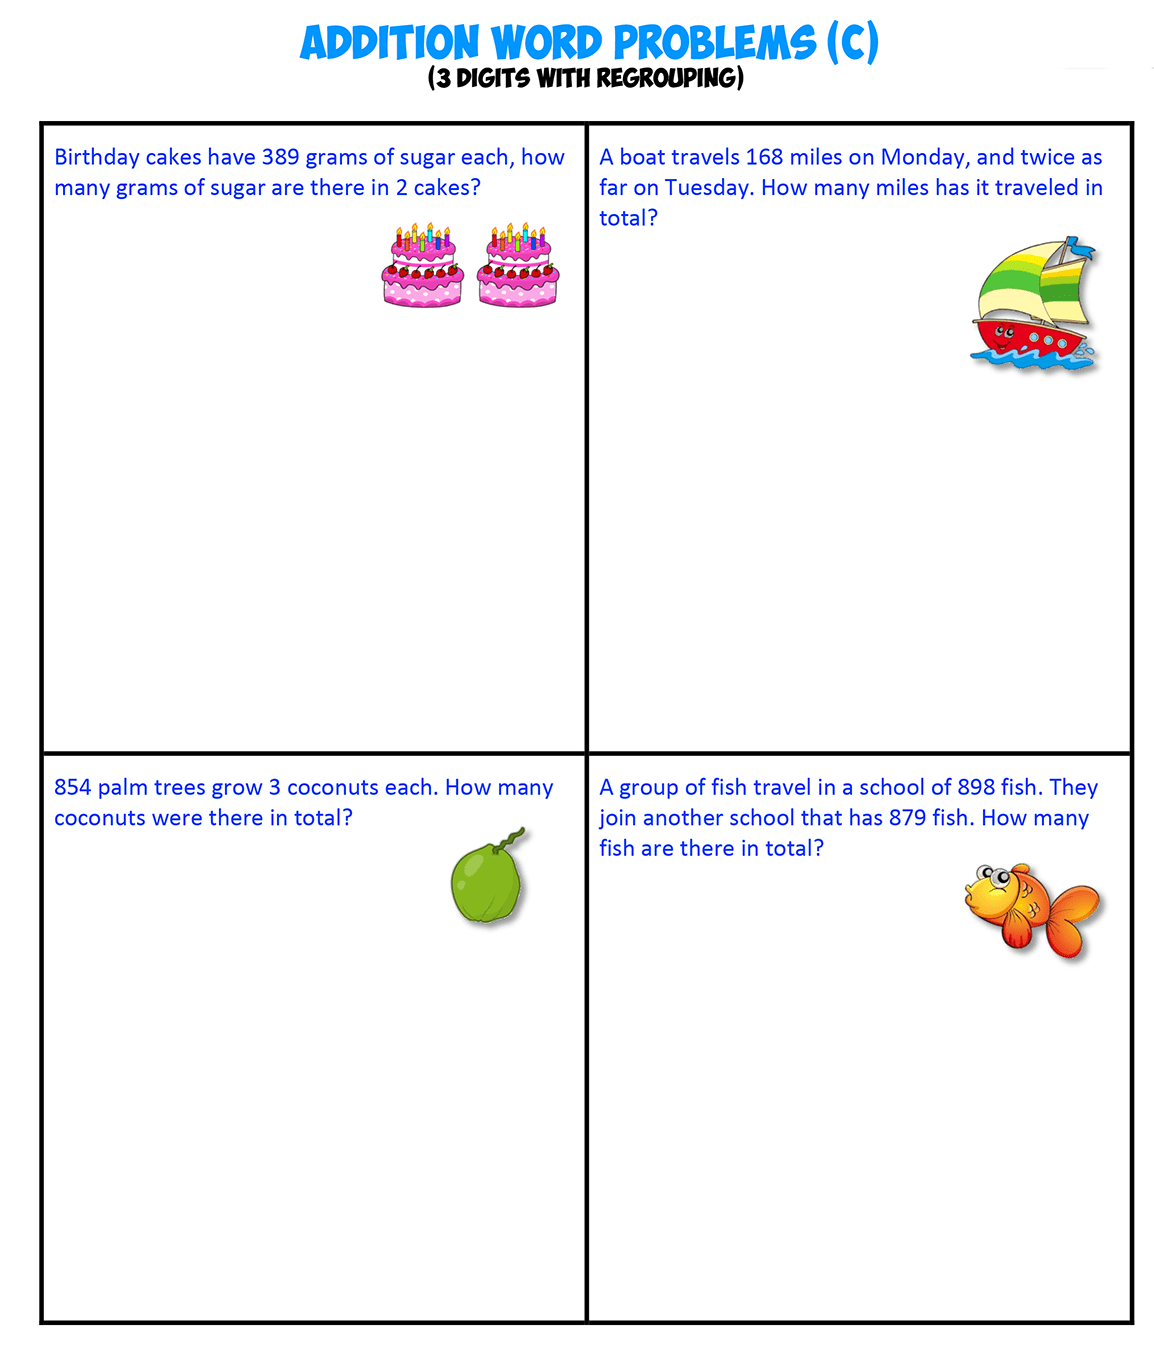 Addition Word Problems C